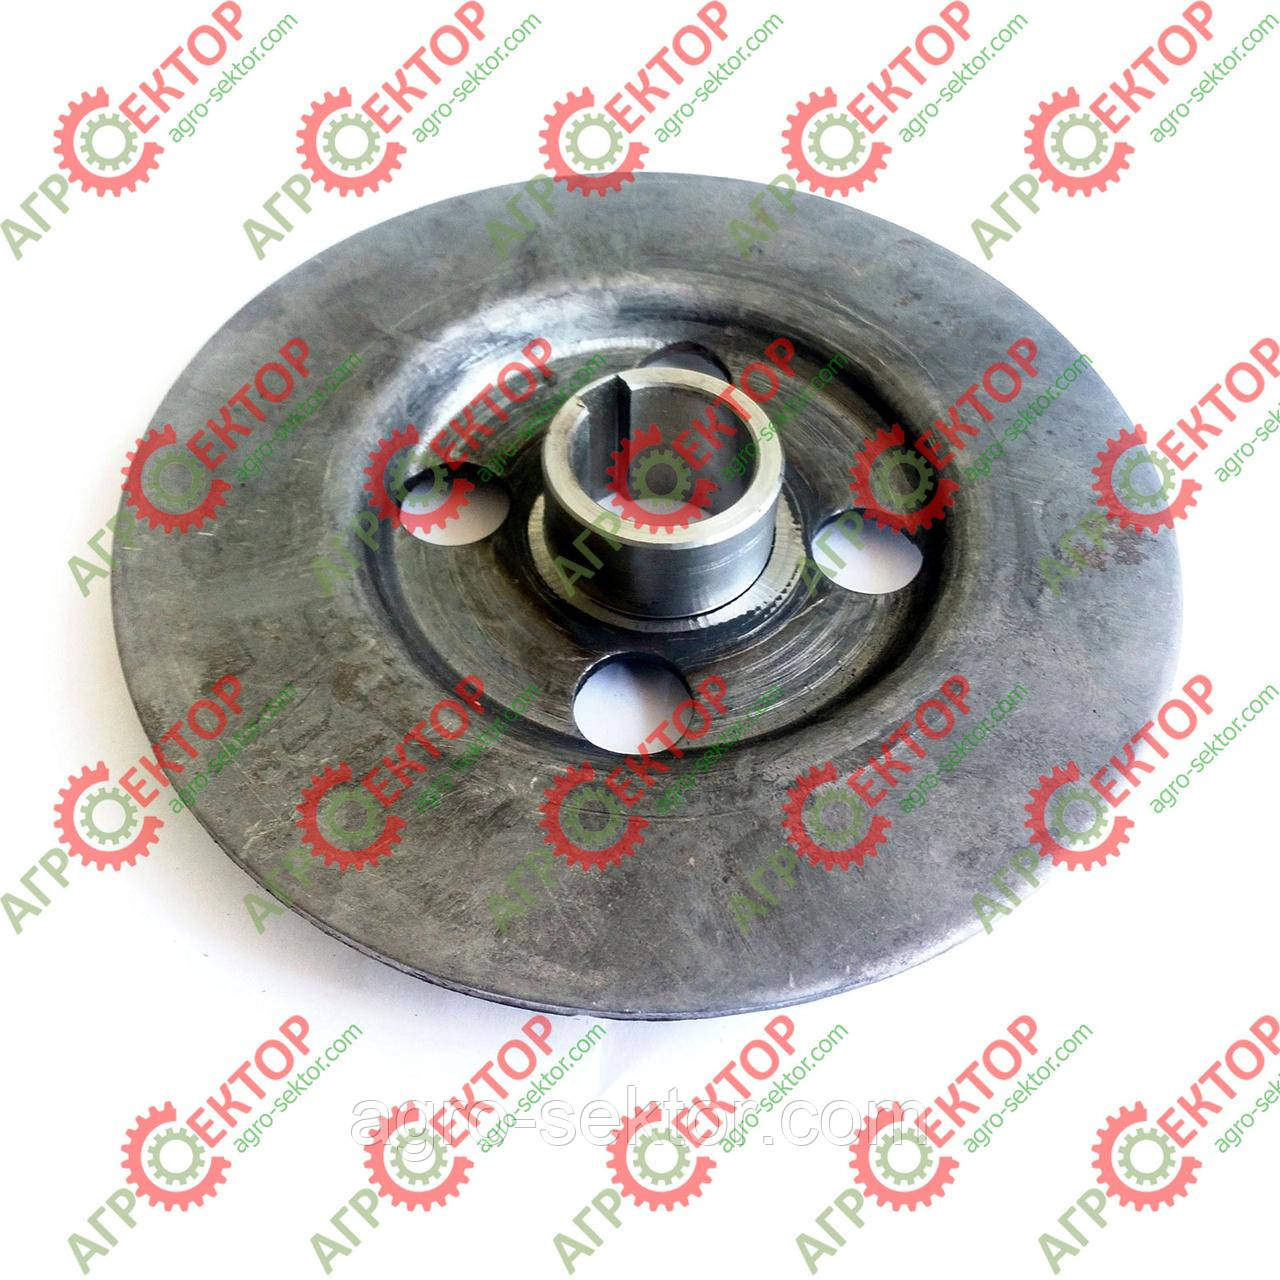 Тормозной диск вала стола в'язального на прес-підбирач Famarol Z-511 8245-511-007-348